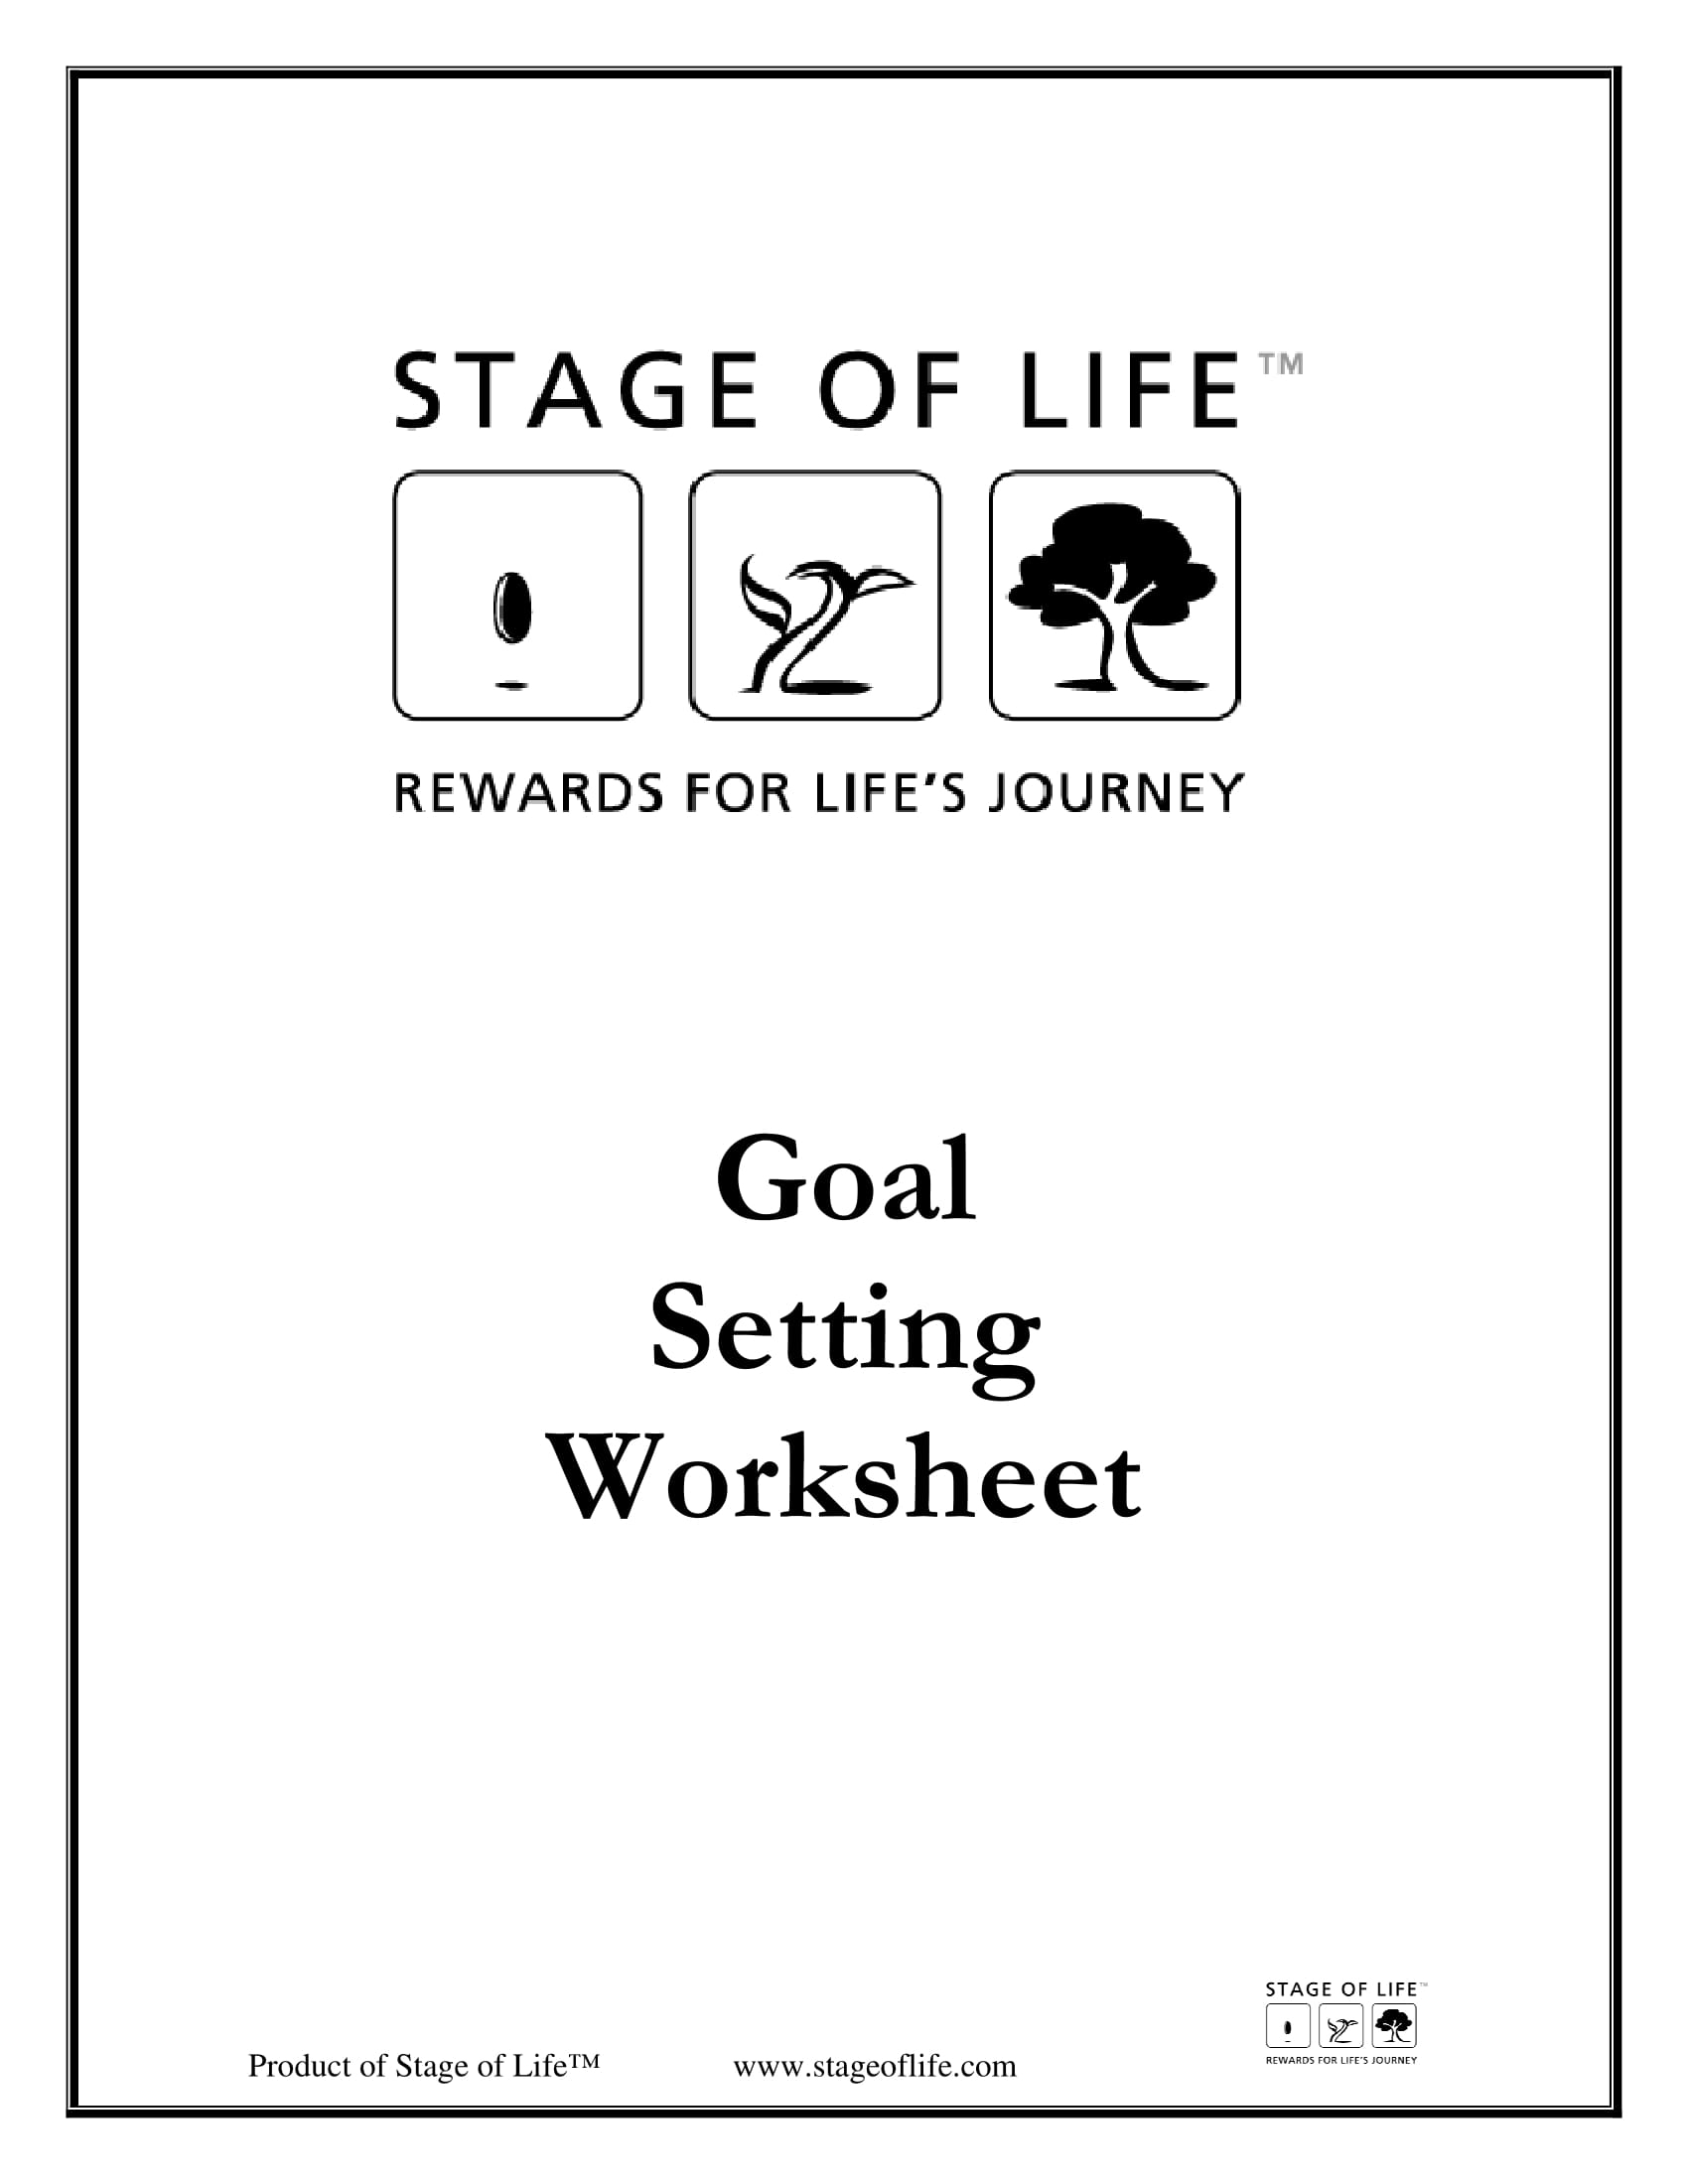 goal setting worksheet example for public speaking executive